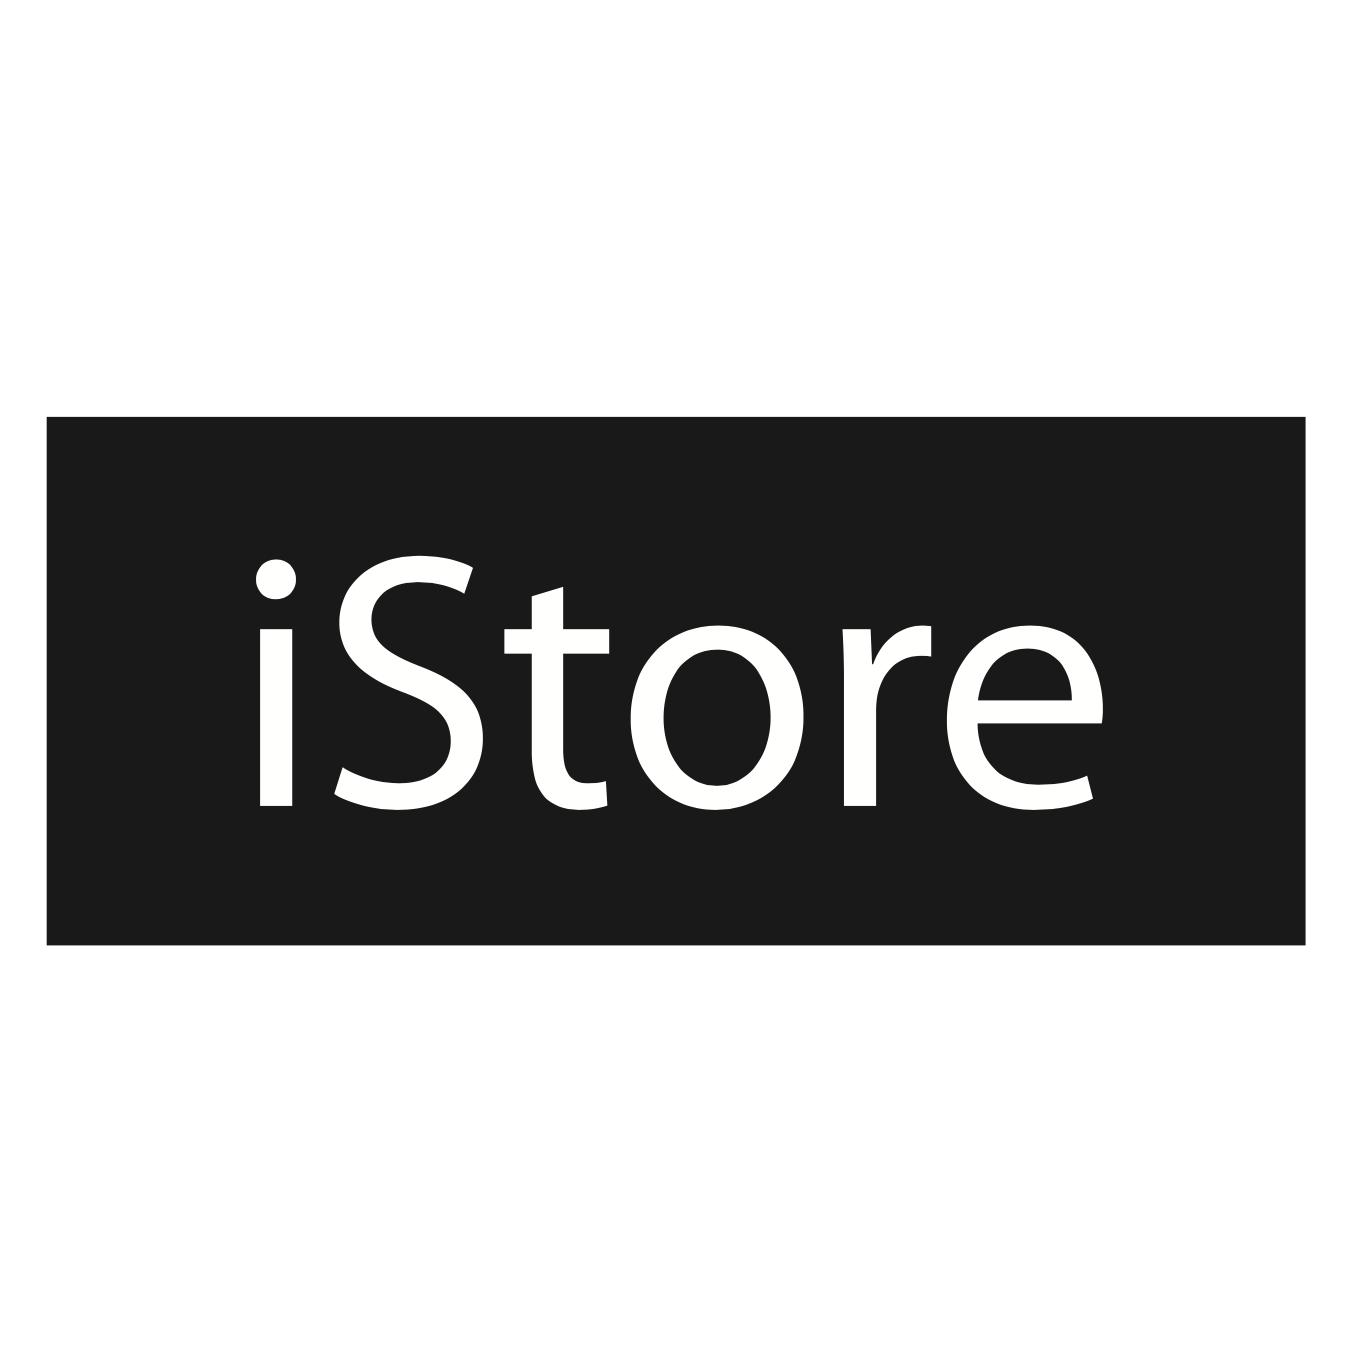 iPhone 6 16GB - Silver